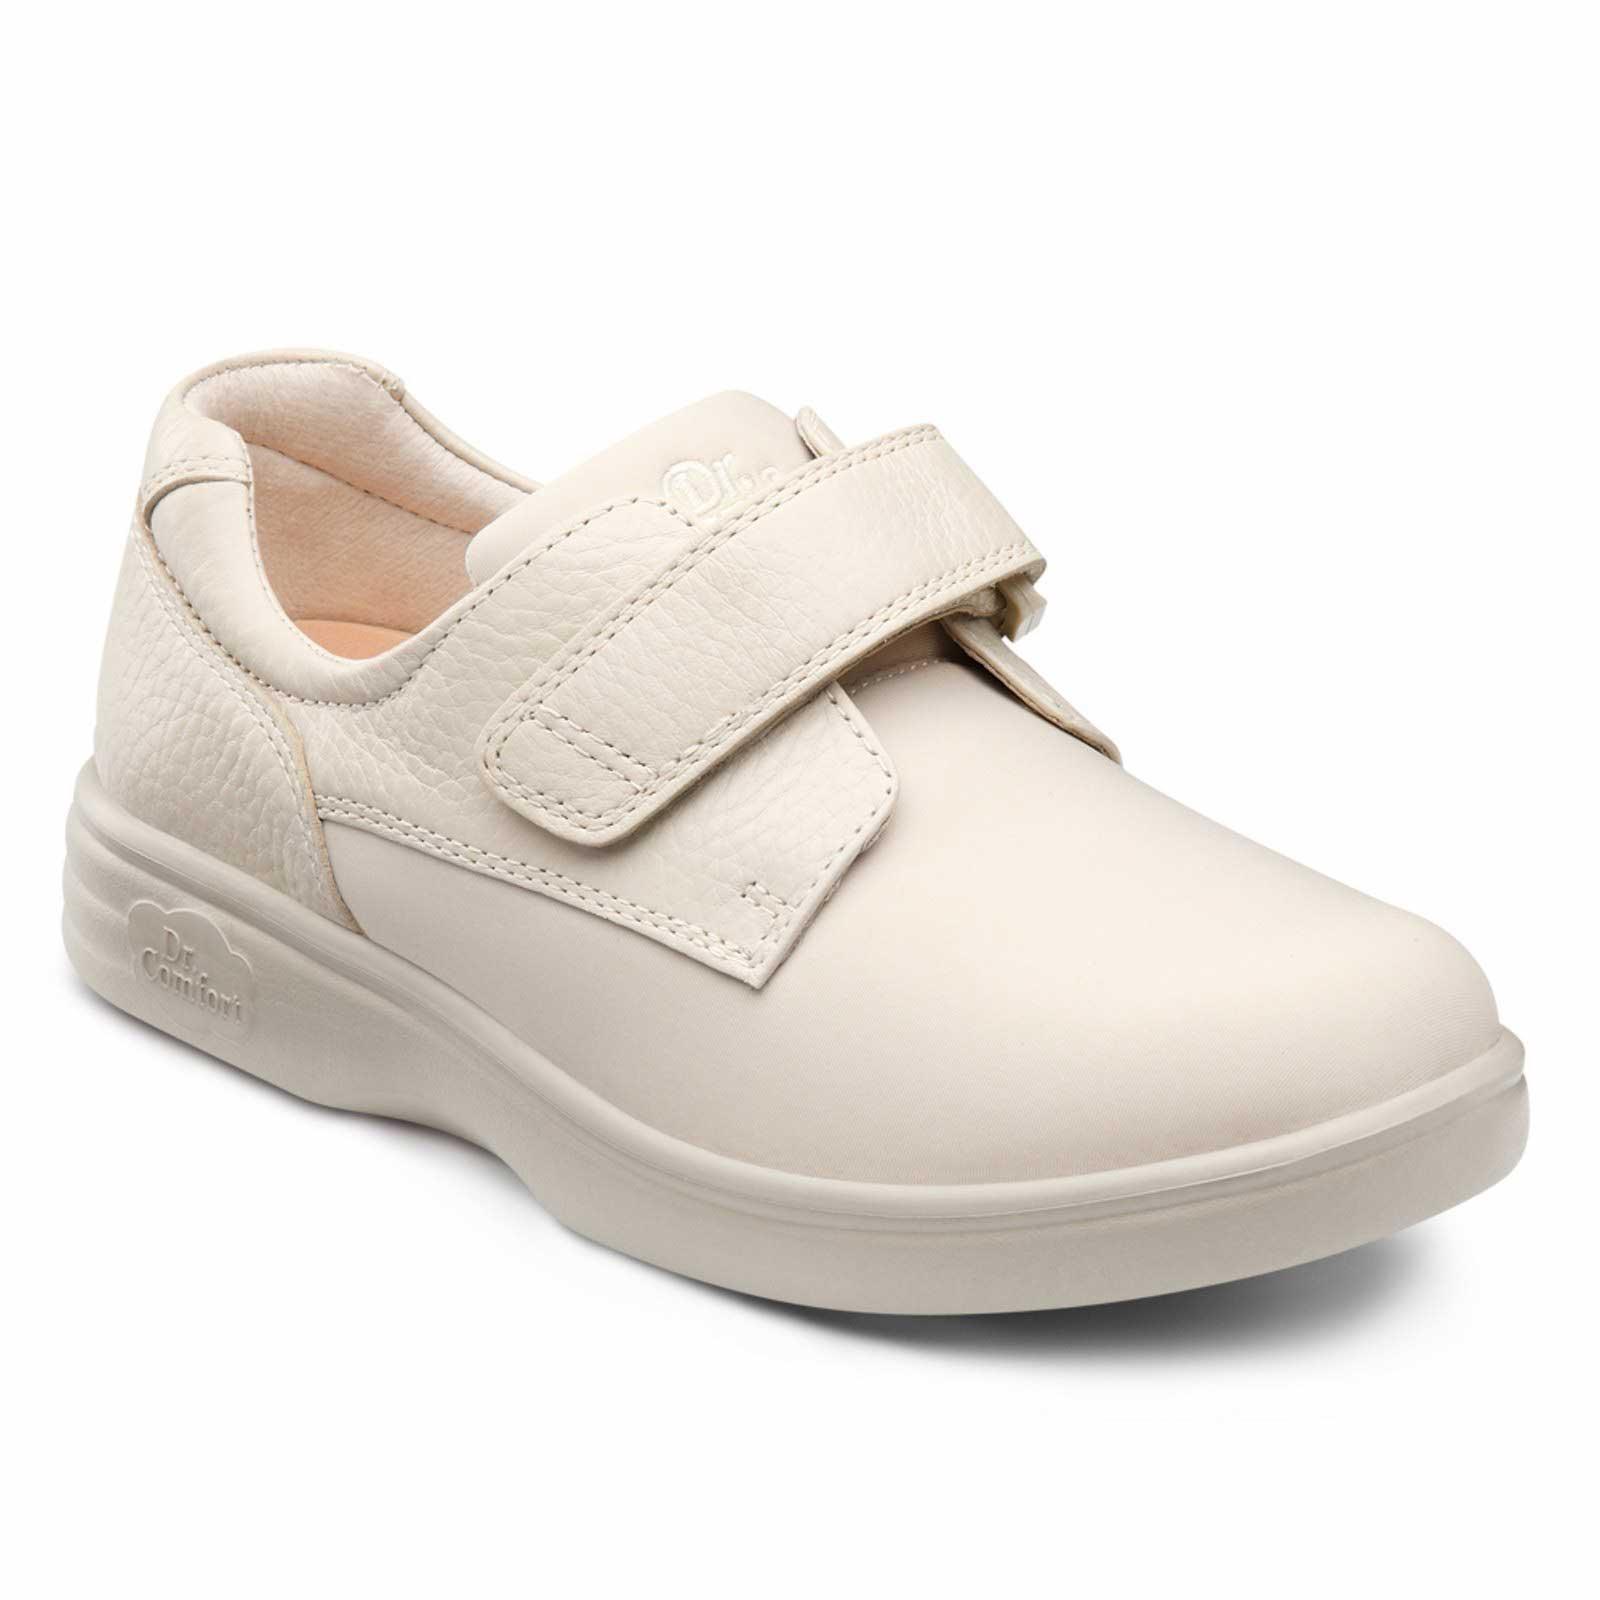 White Orthopedic Shoes